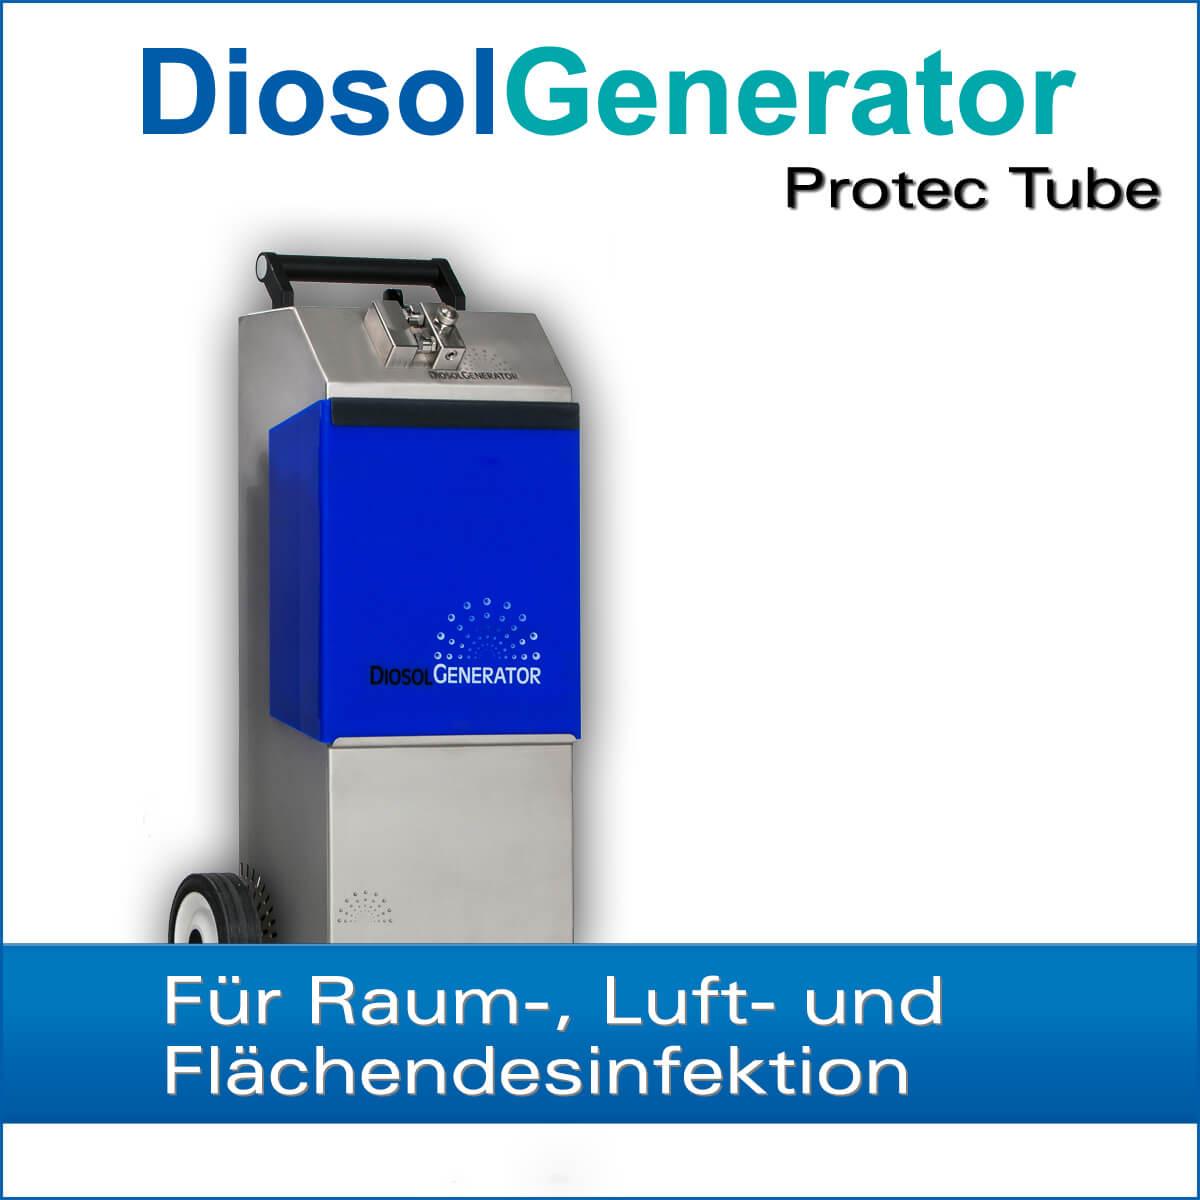 h2o2 verneblungsgerät diosolgenerator protec tube